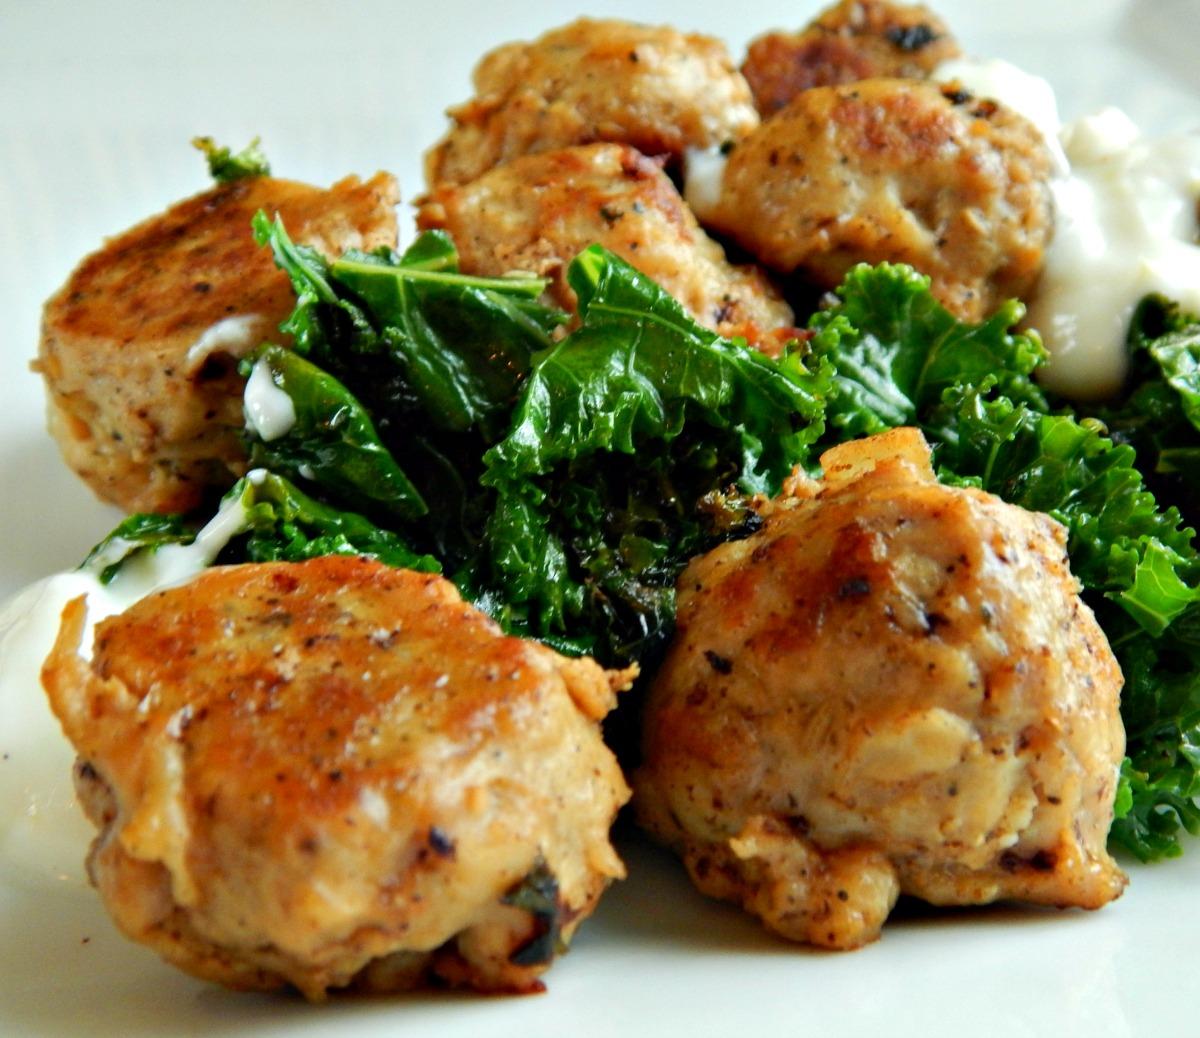 Healthy Italian Wedding Soup with Chicken Meatballs | Frugal Hausfrau